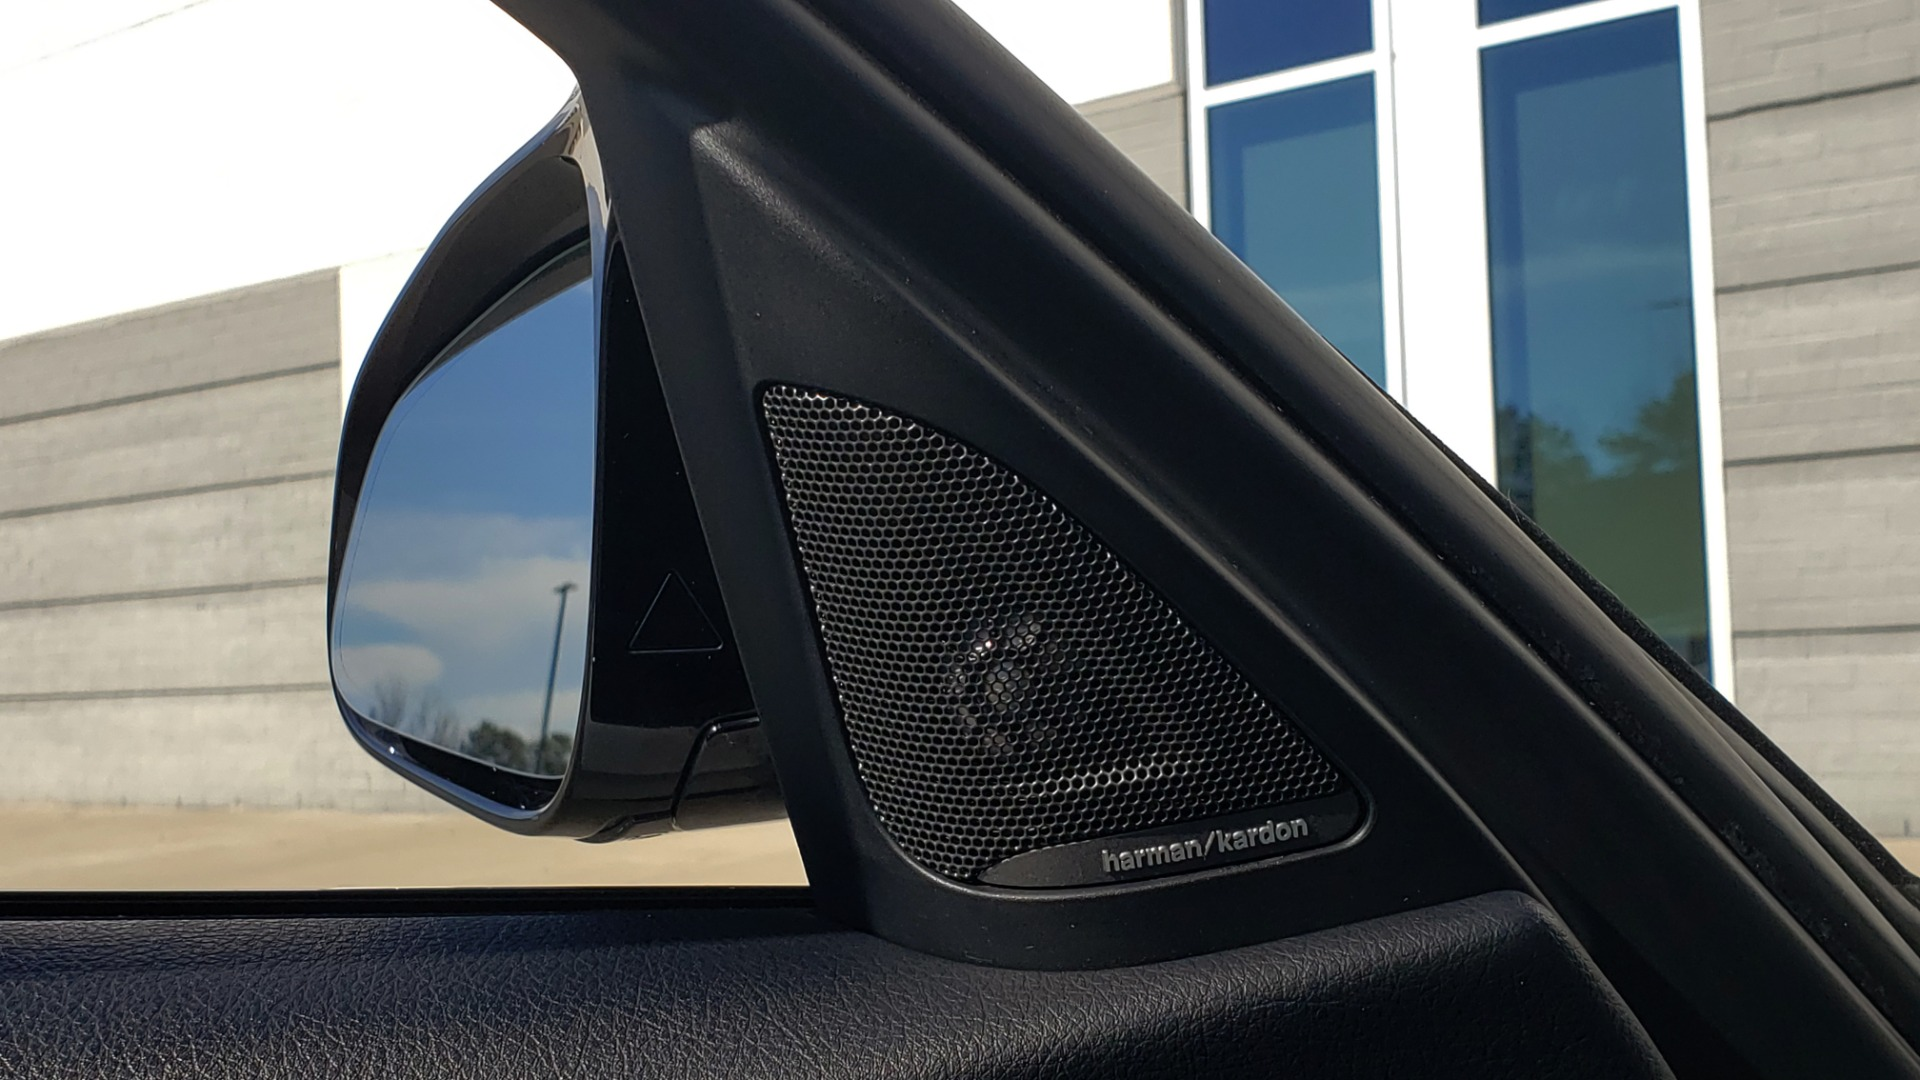 Used 2016 BMW M3 SEDAN / EXECUTIVE PKG / M-SUSPENSION / HARMAN/KARDON SOUND for sale Sold at Formula Imports in Charlotte NC 28227 44